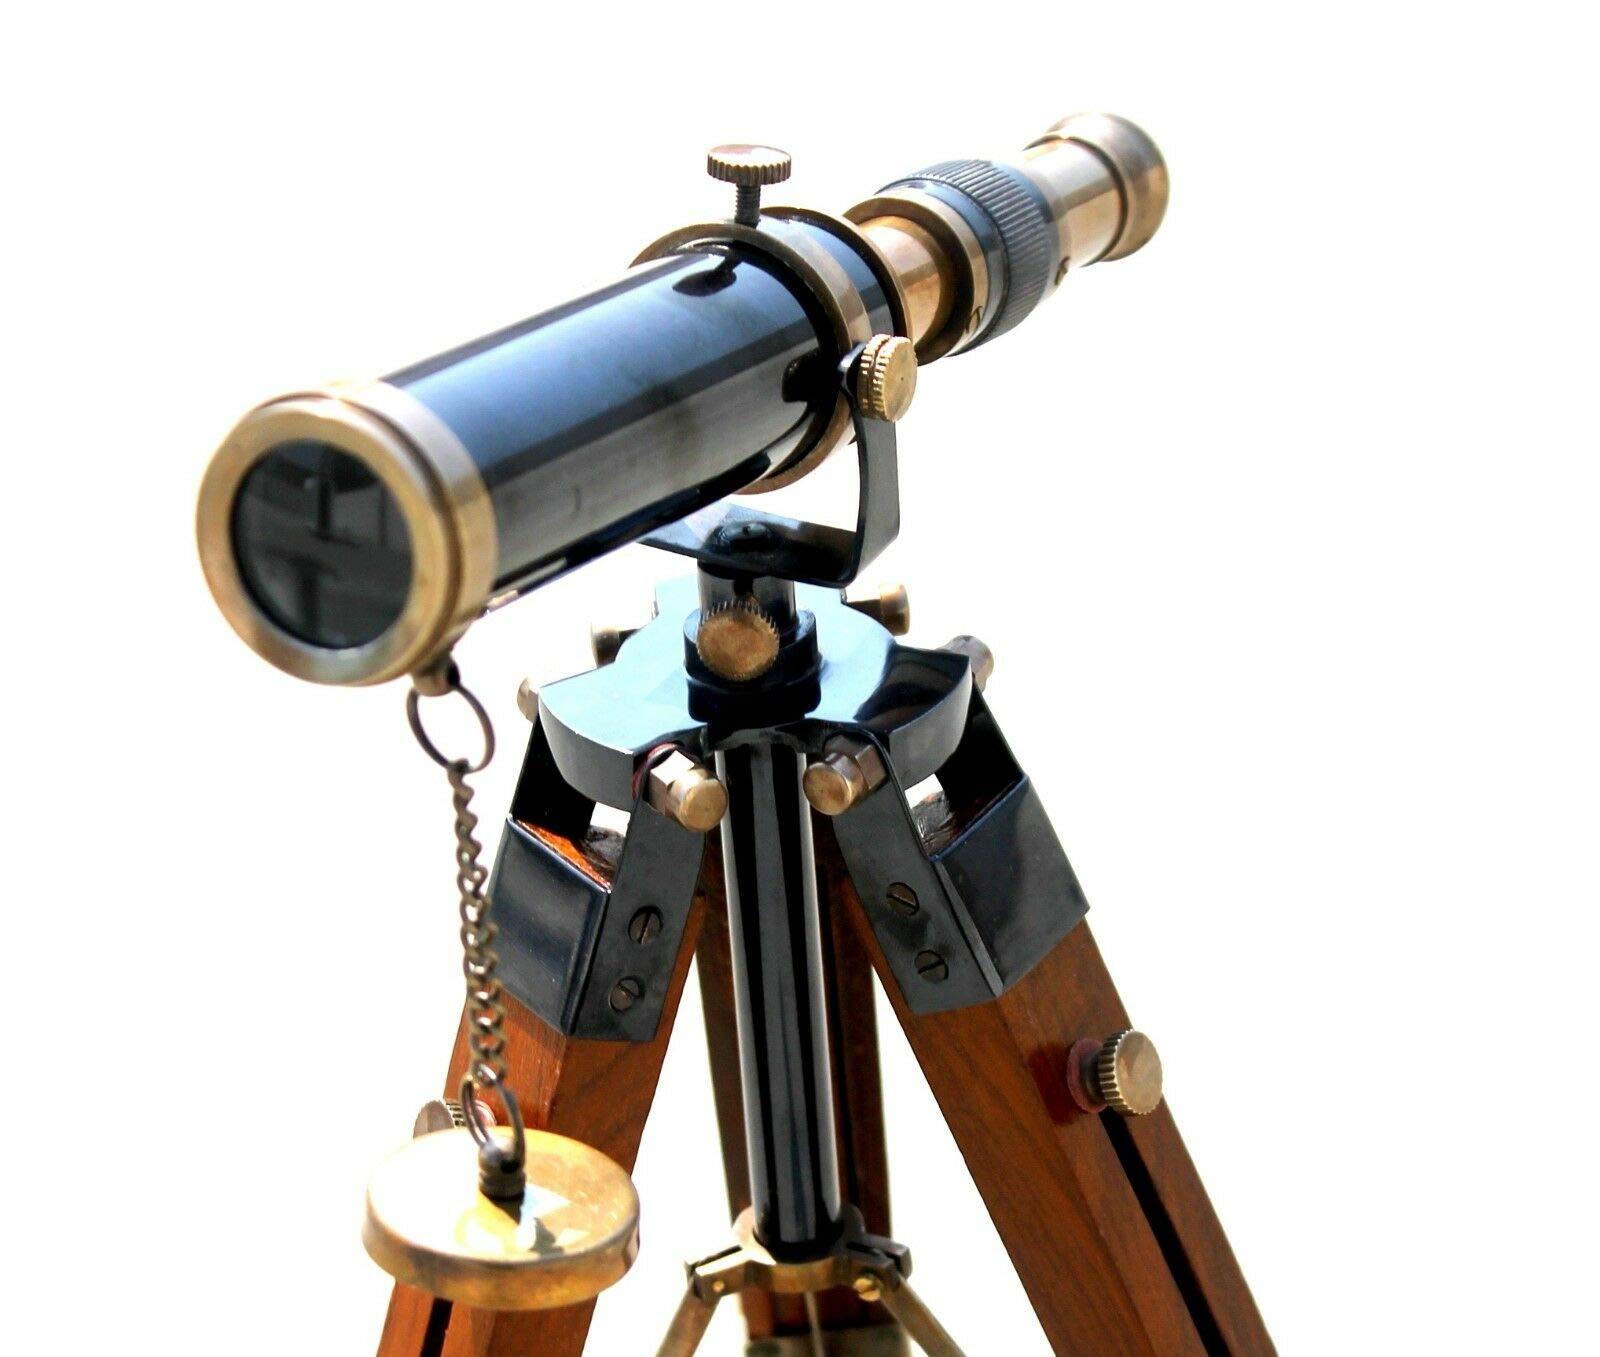 PIRU Brass Antique Telescope W/Wooden Adjustable Tripod Working Astrolabe Item.